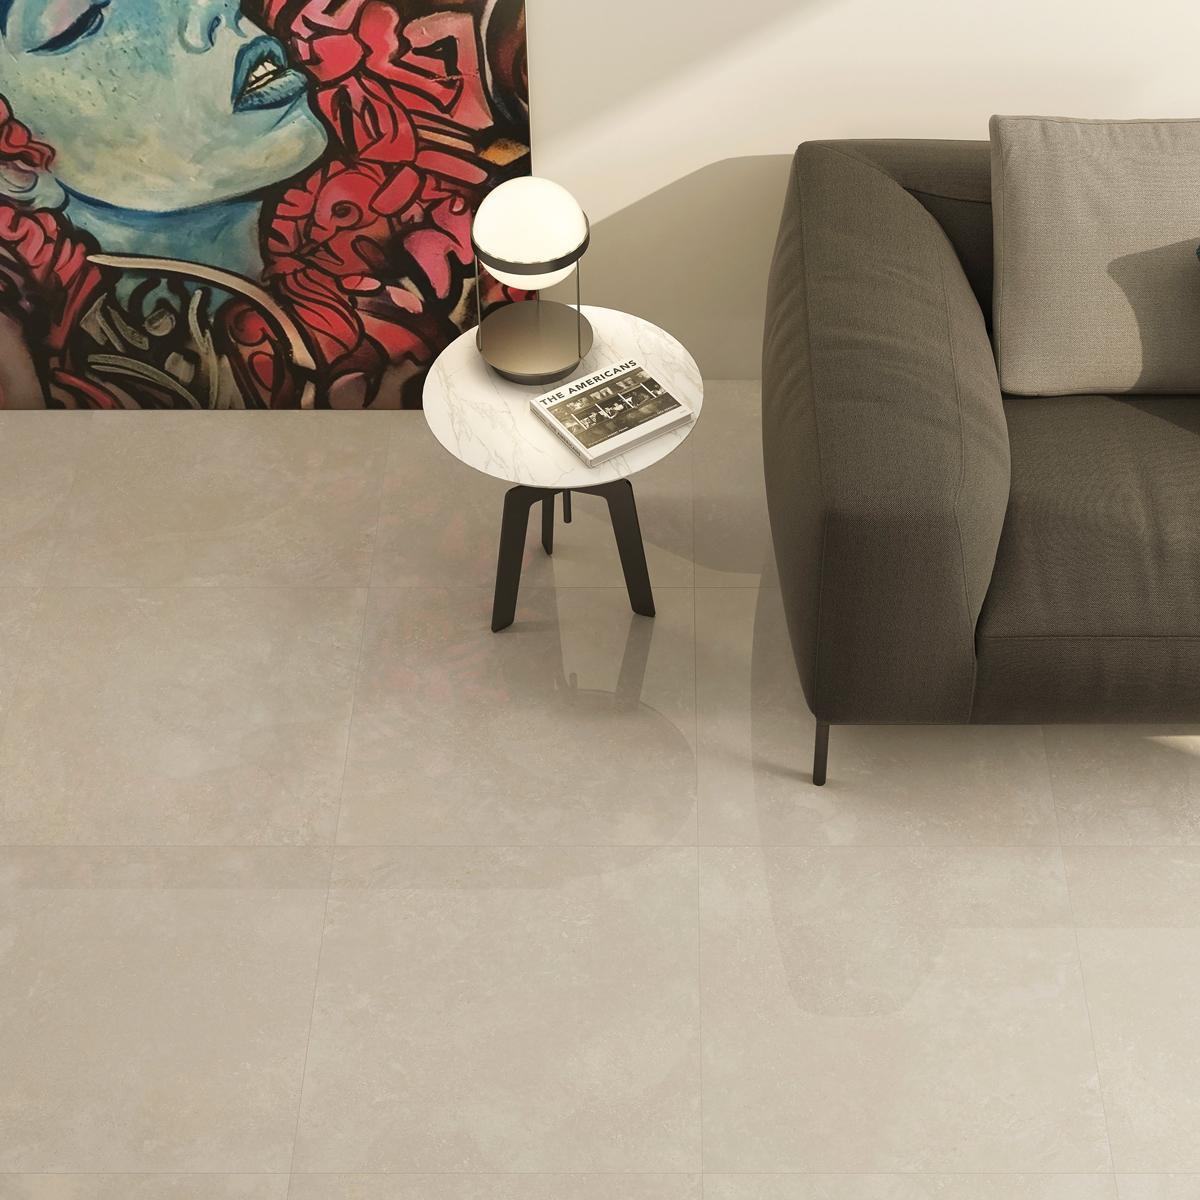 Porcelanato Howen Marfil Brillante - 60.8X60.8 cm - 1.85 m2